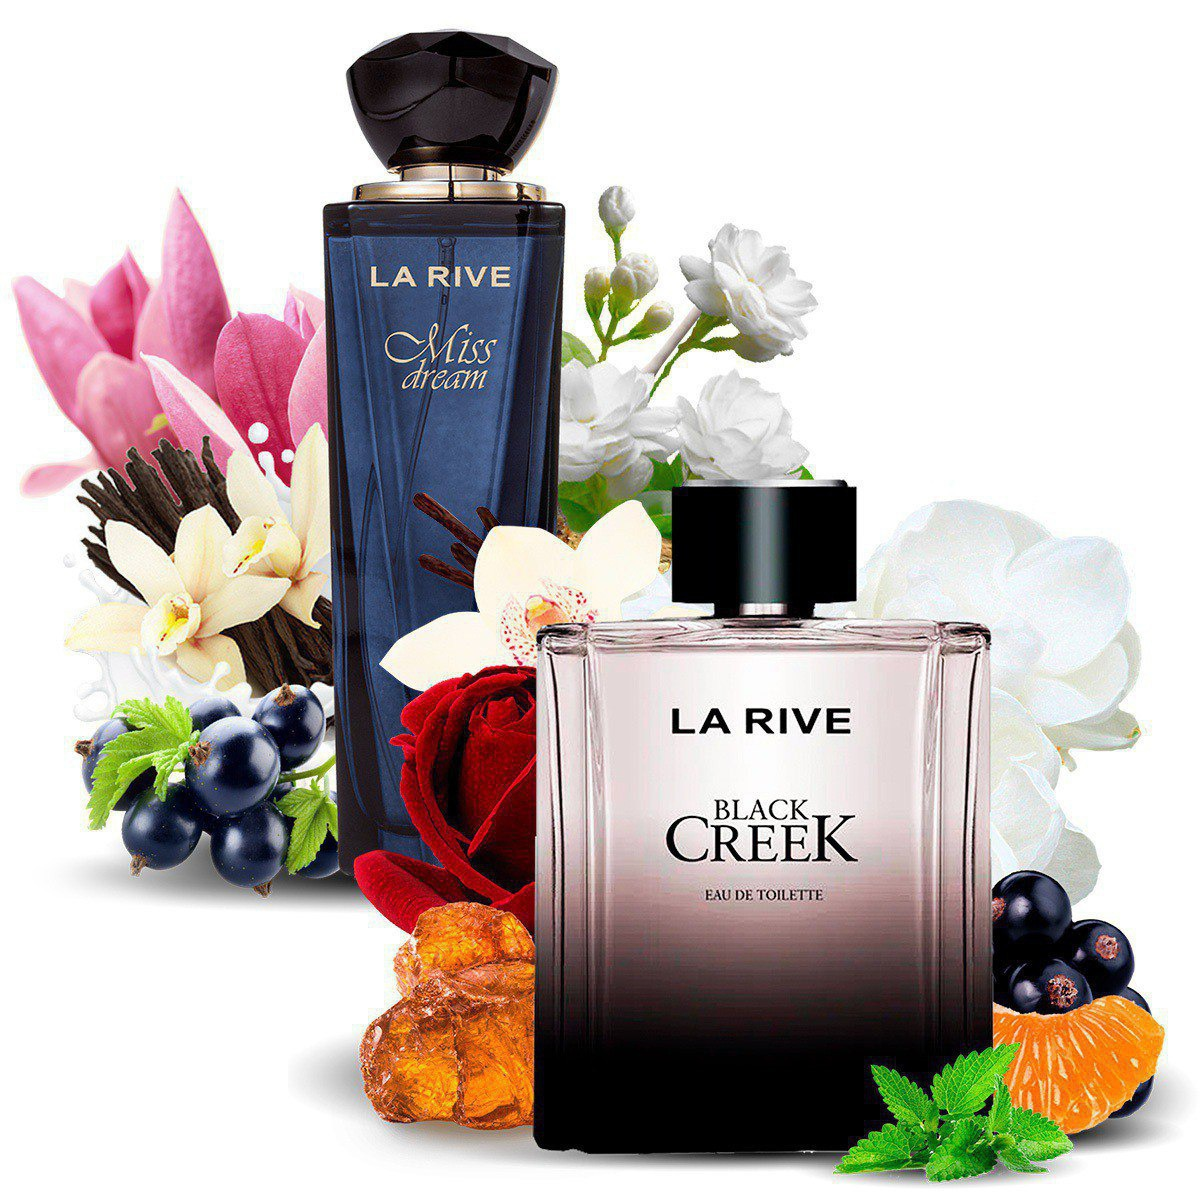 Kit 2 Perfumes Importados Miss Dream e Black Creek La Rive  - Mercari Perfumes